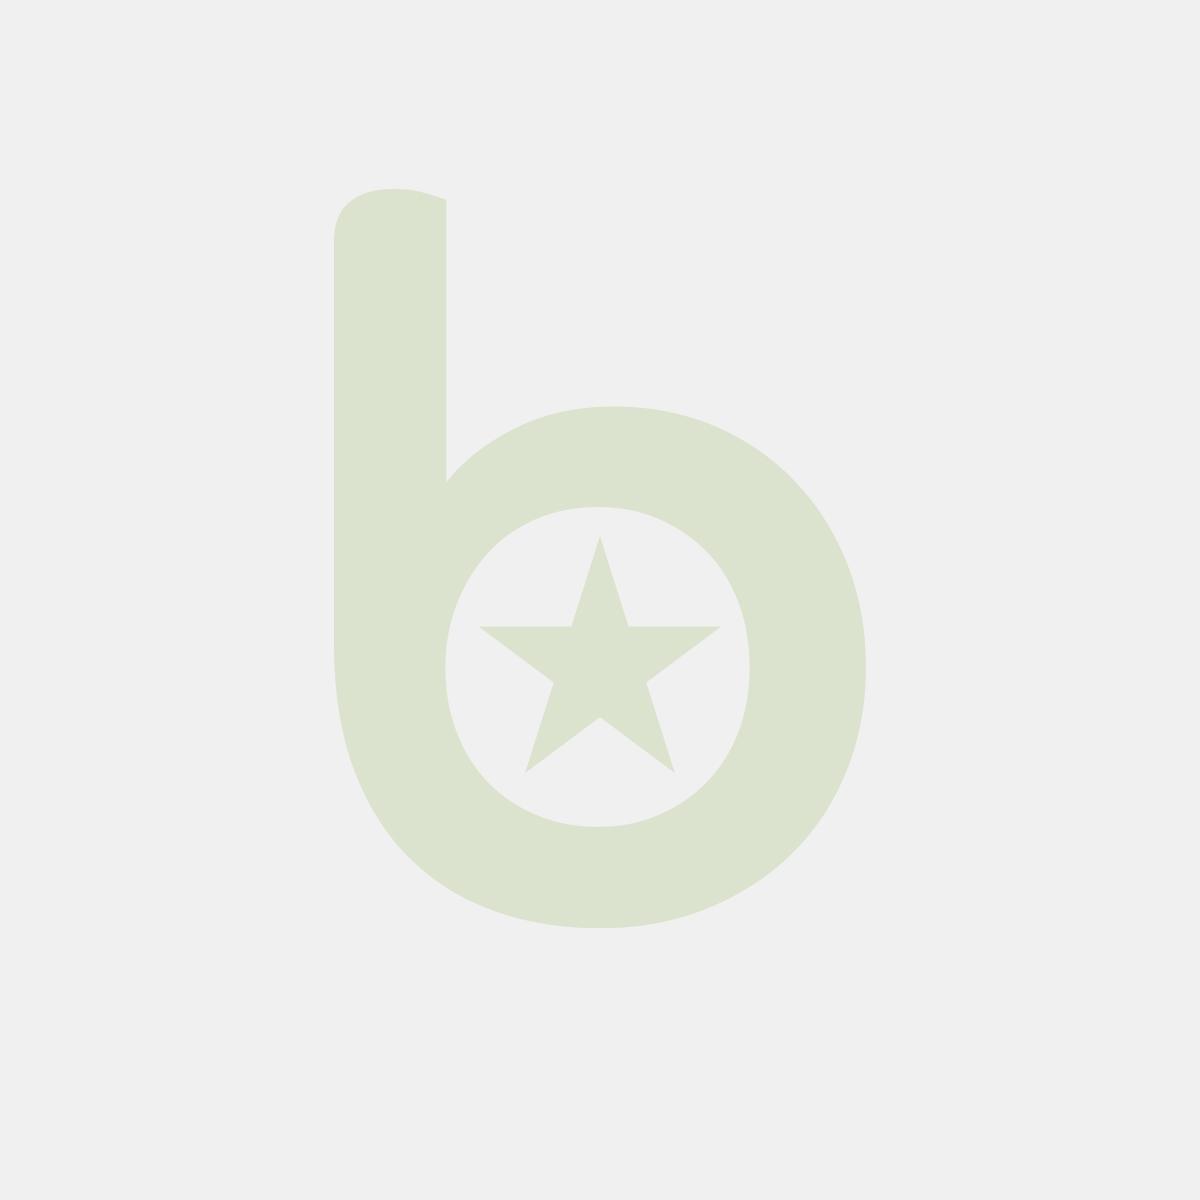 Łyżeczka MINI FINGERFOOD kolor: biały, 10 cm, PS, 50 szt. w opakowaniu